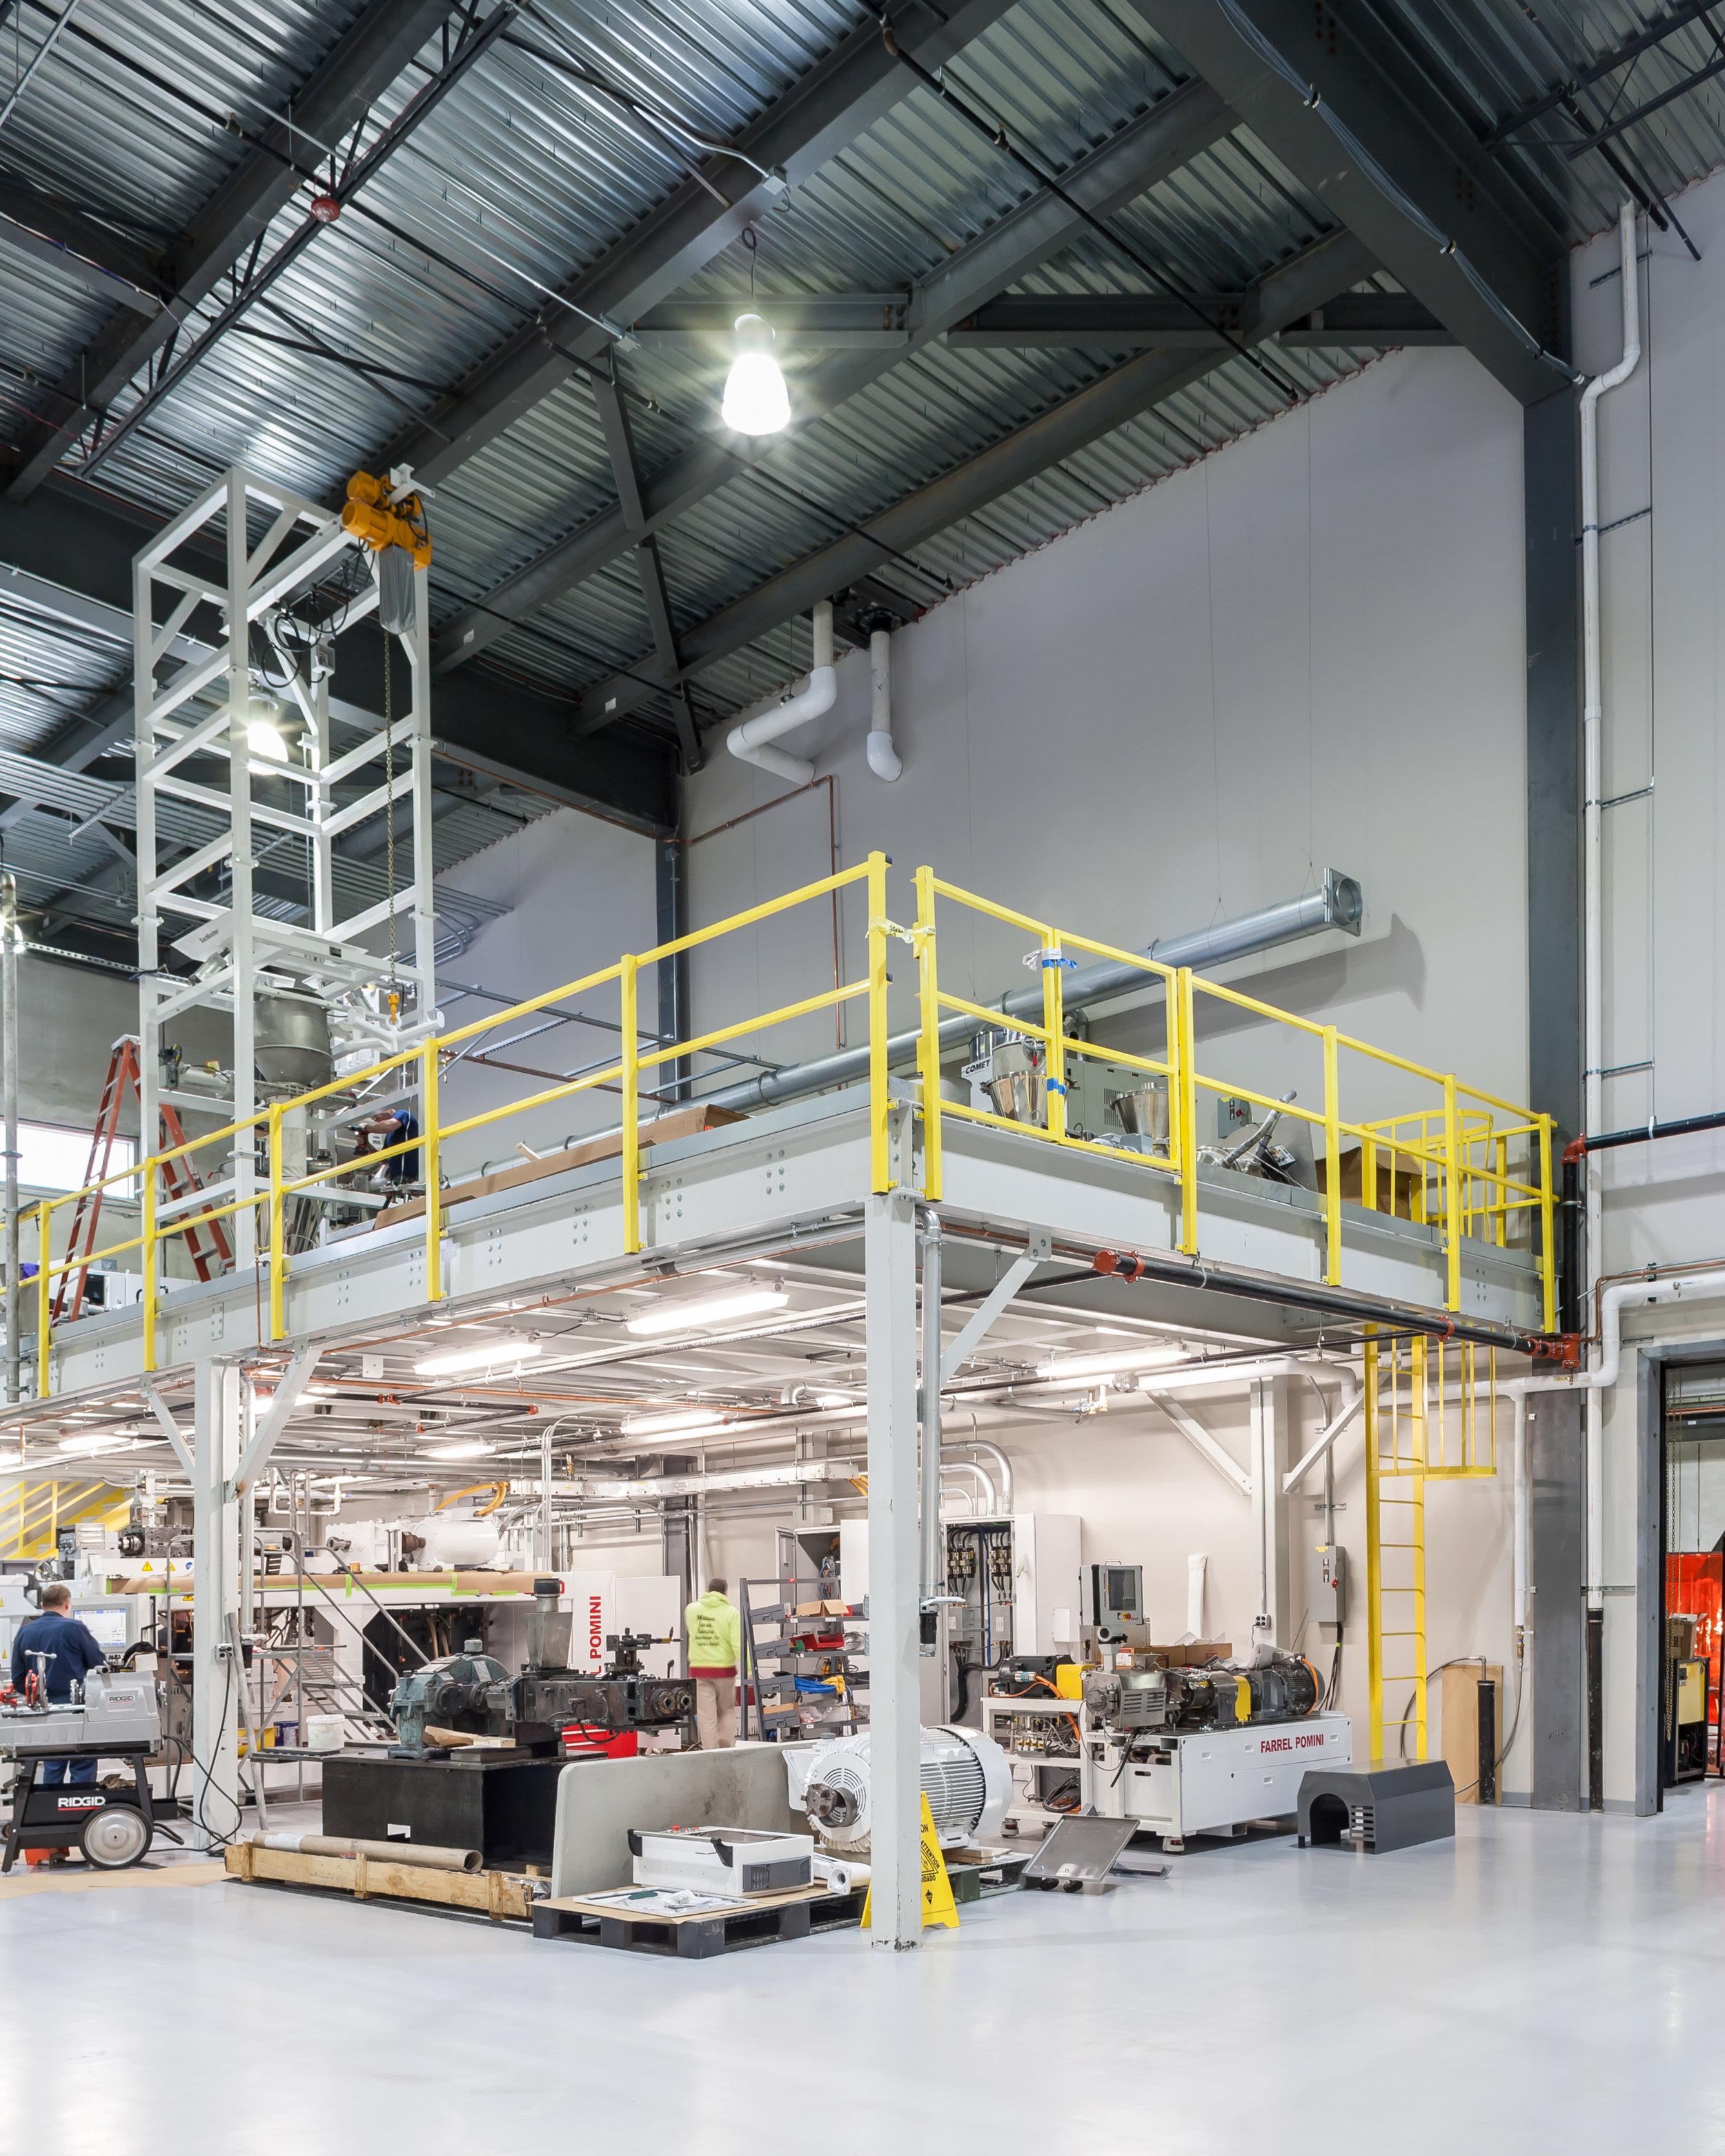 factory_IMG_4149.JPG